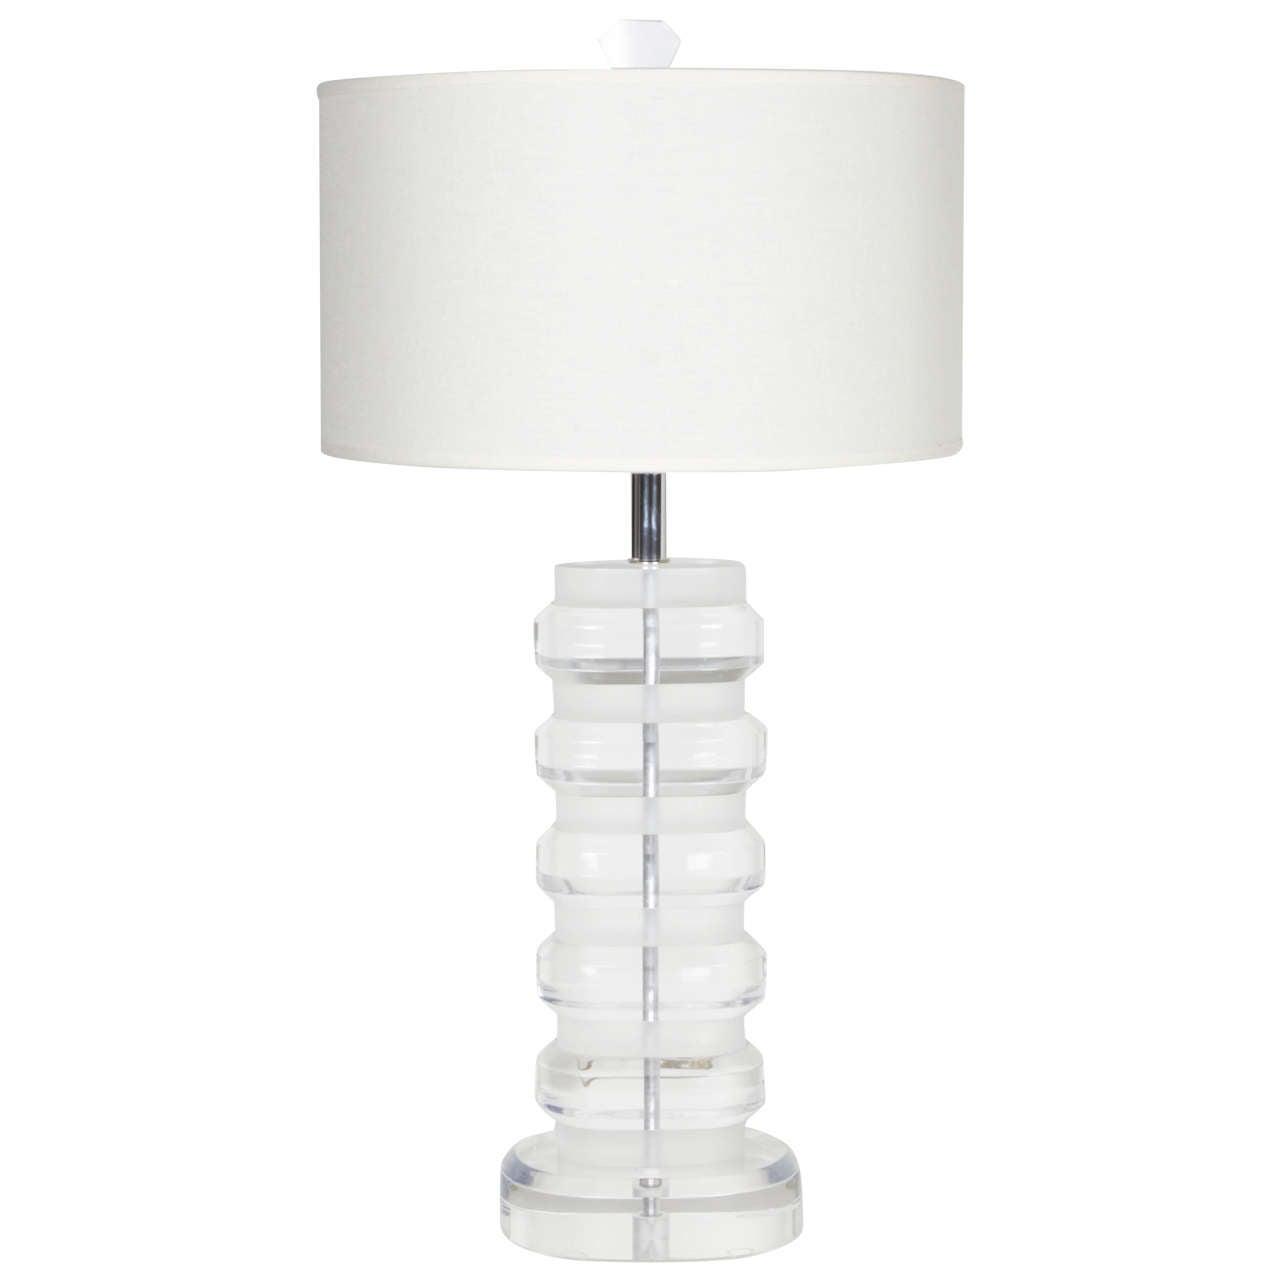 Modernist Lucite Block Table Lamp in the style of Karl Springer